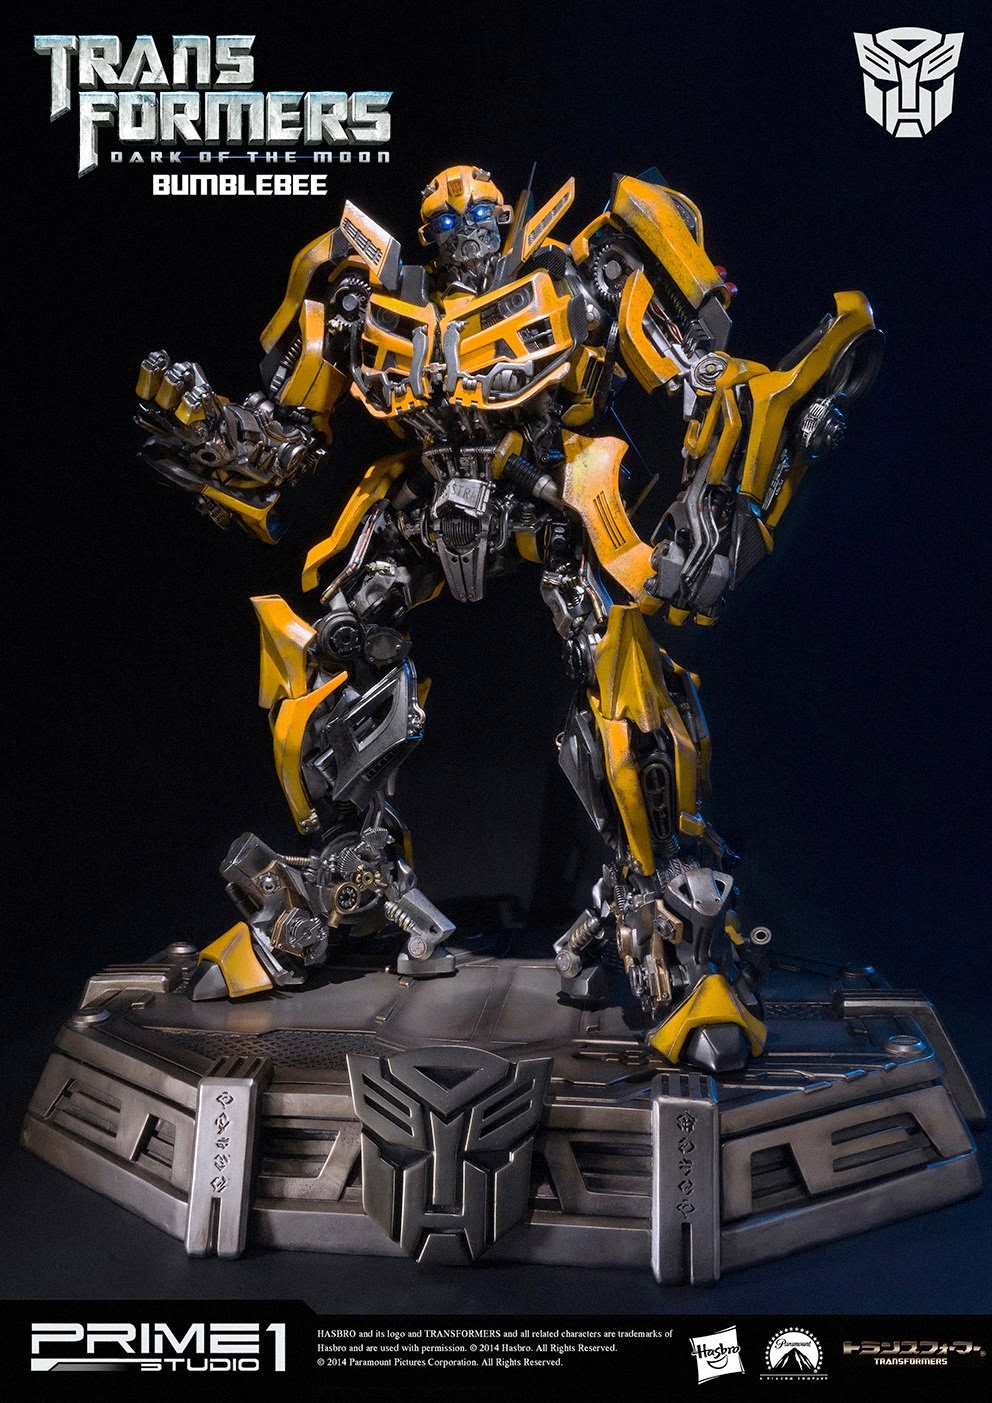 Ecco Bumblebee della Prime 1 Studio